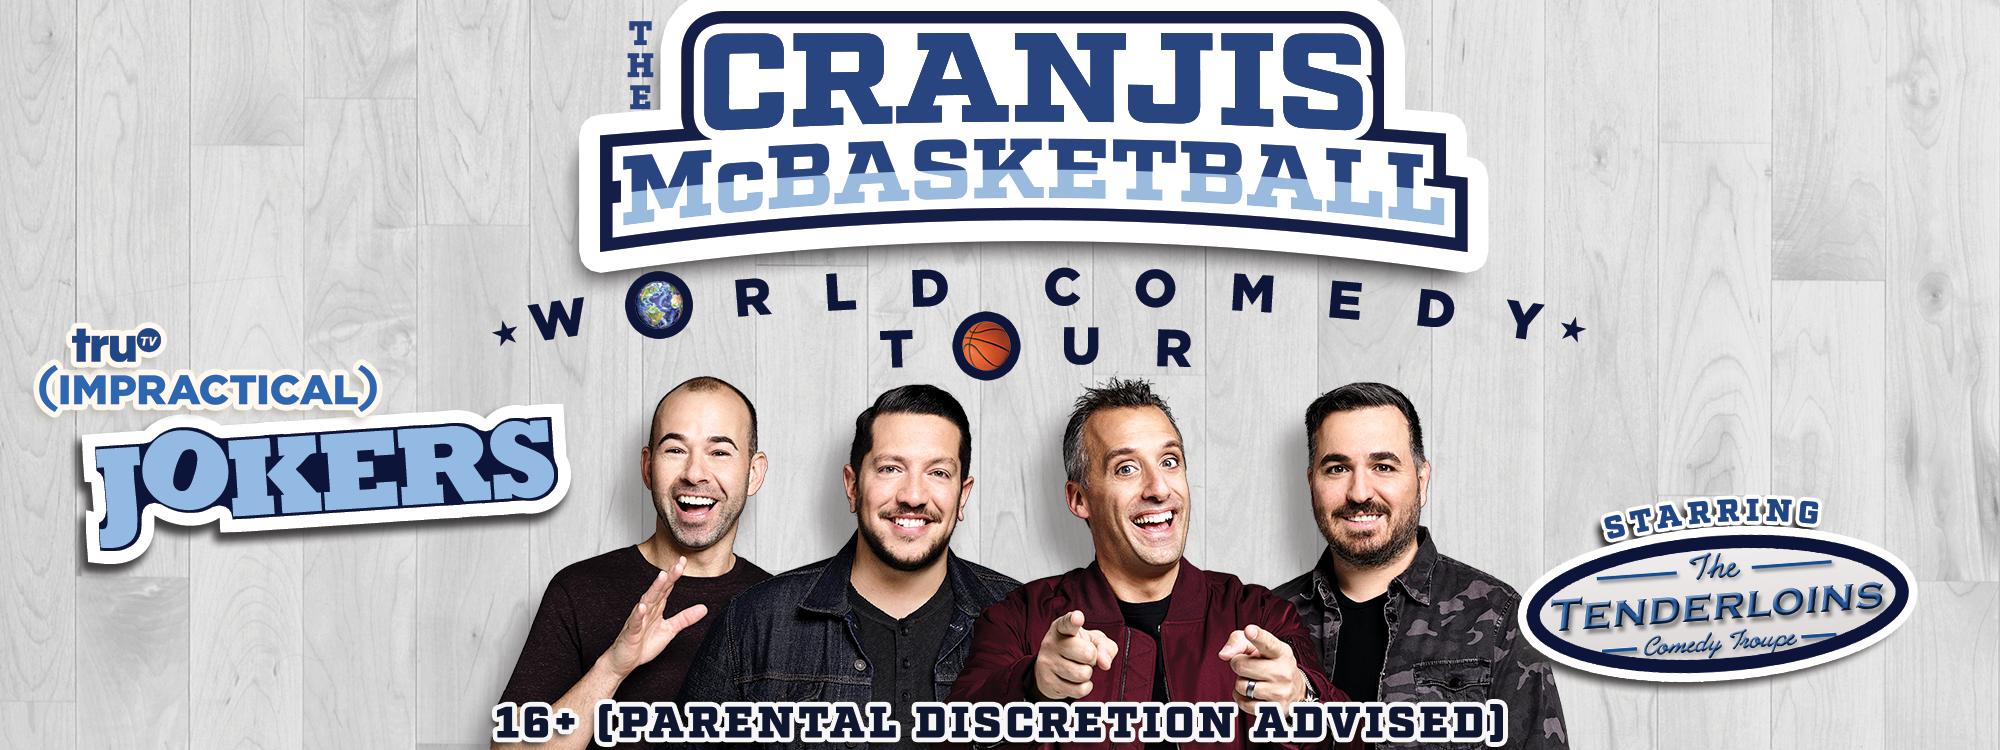 "Universal Hollywood Presents Impractical Jokers ""The Cranjis McBasketball World Comedy Tour"""